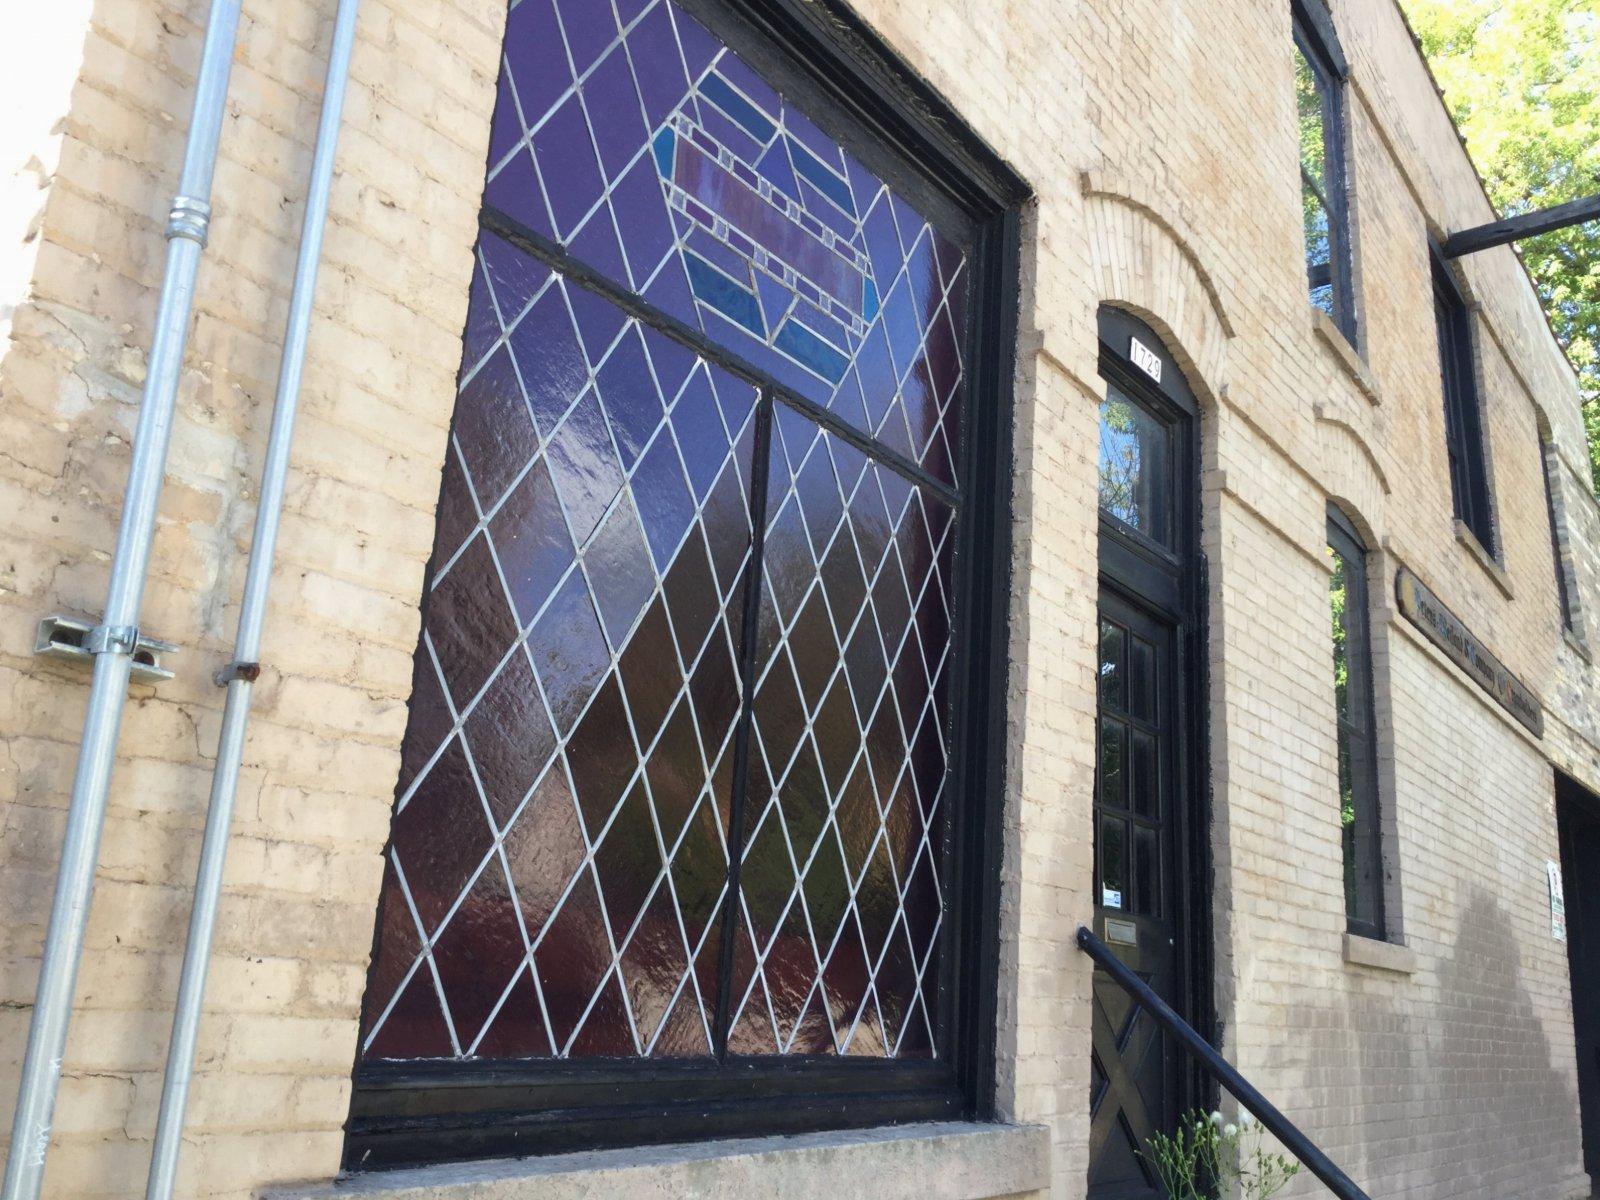 Leaded glass window on Pulaski St.